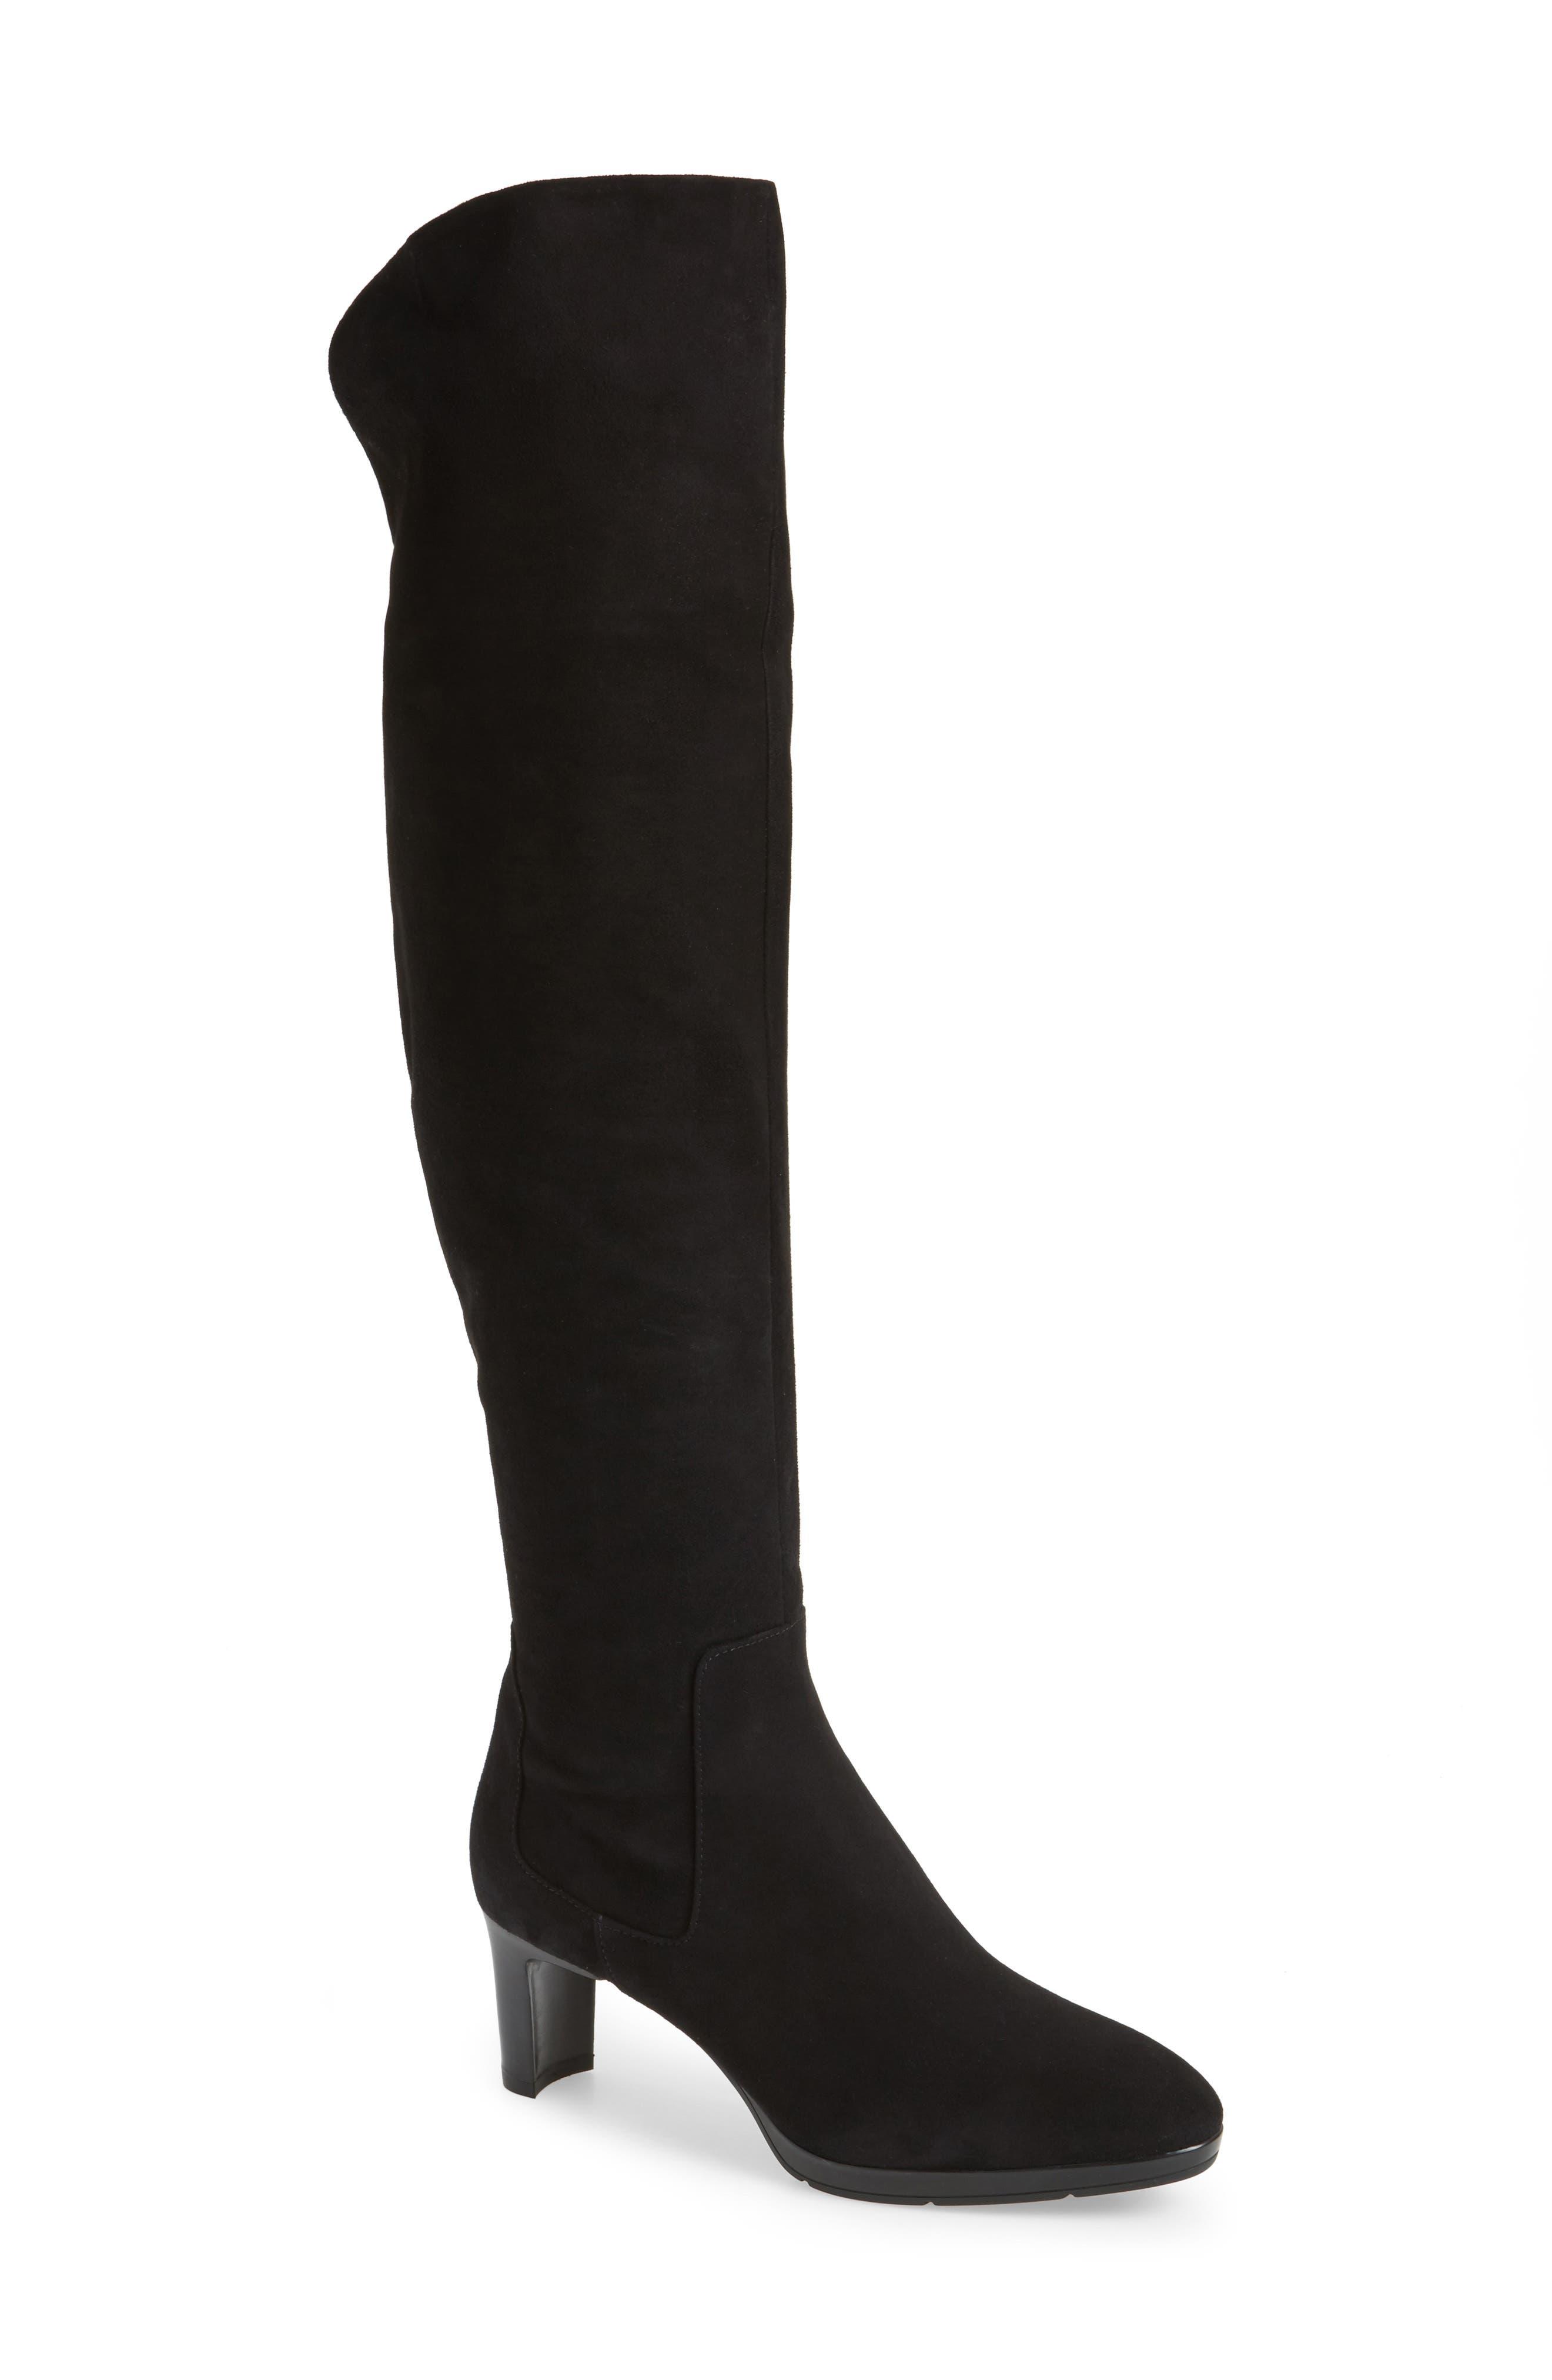 Alternate Image 1 Selected - Aquatalia Danika Weatherproof Over-the-Knee Boot (Women)